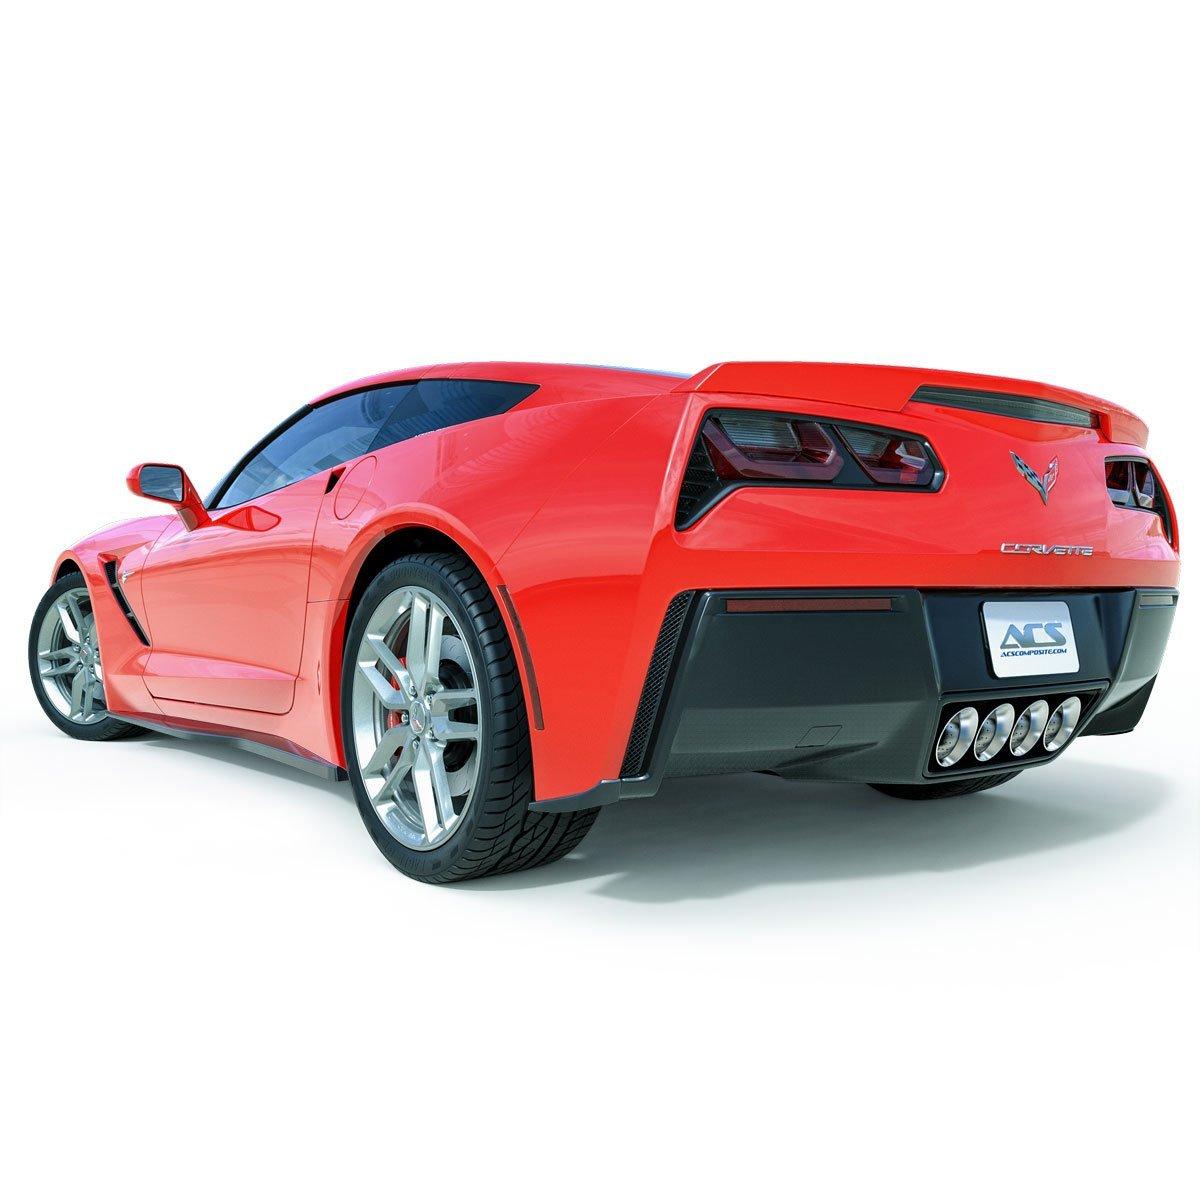 ACS Composite C7 Corvette Rear Fascia Extensions Made via Plastic Injection ABS PC Stingray